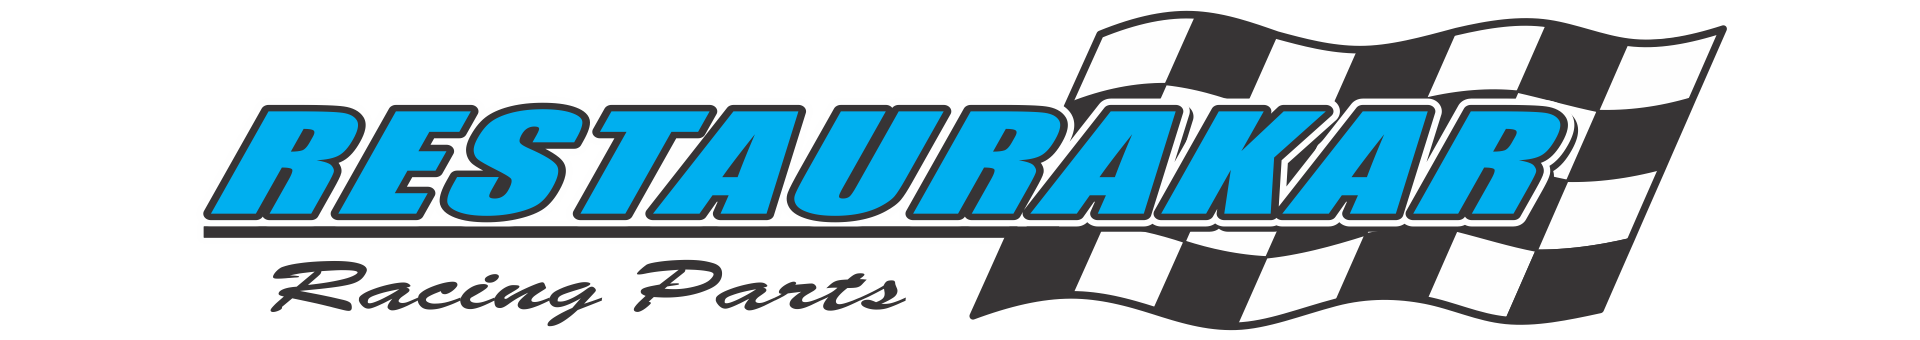 Restaurakar Racing Parts